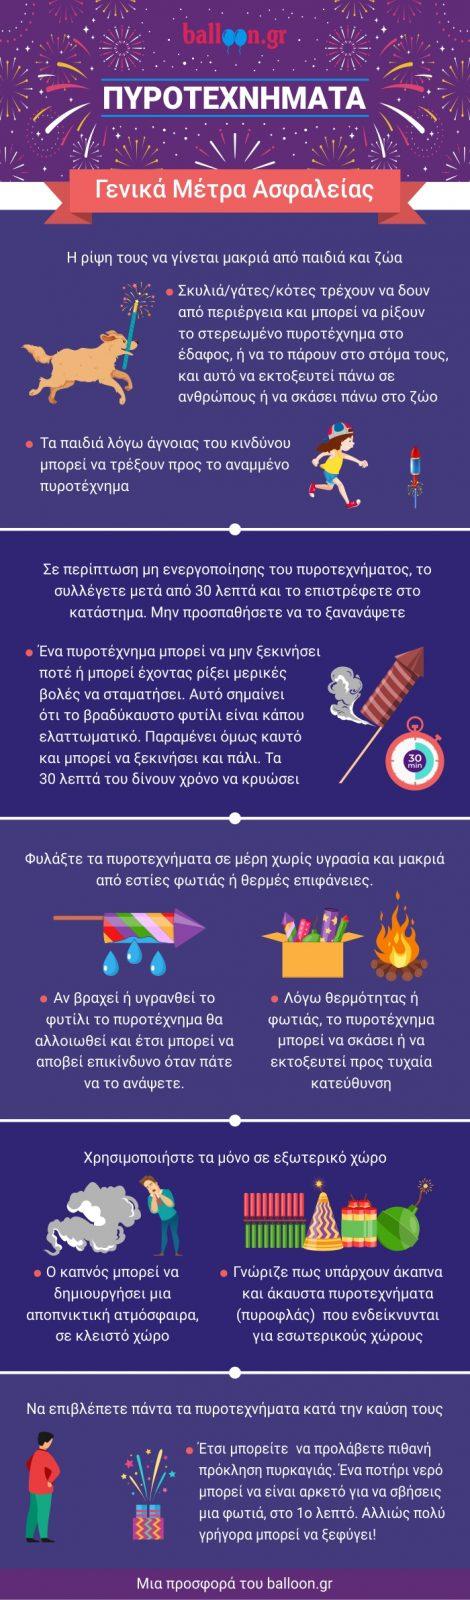 infographic Κανόνες ασφαλείας πυροτεχνημάτων